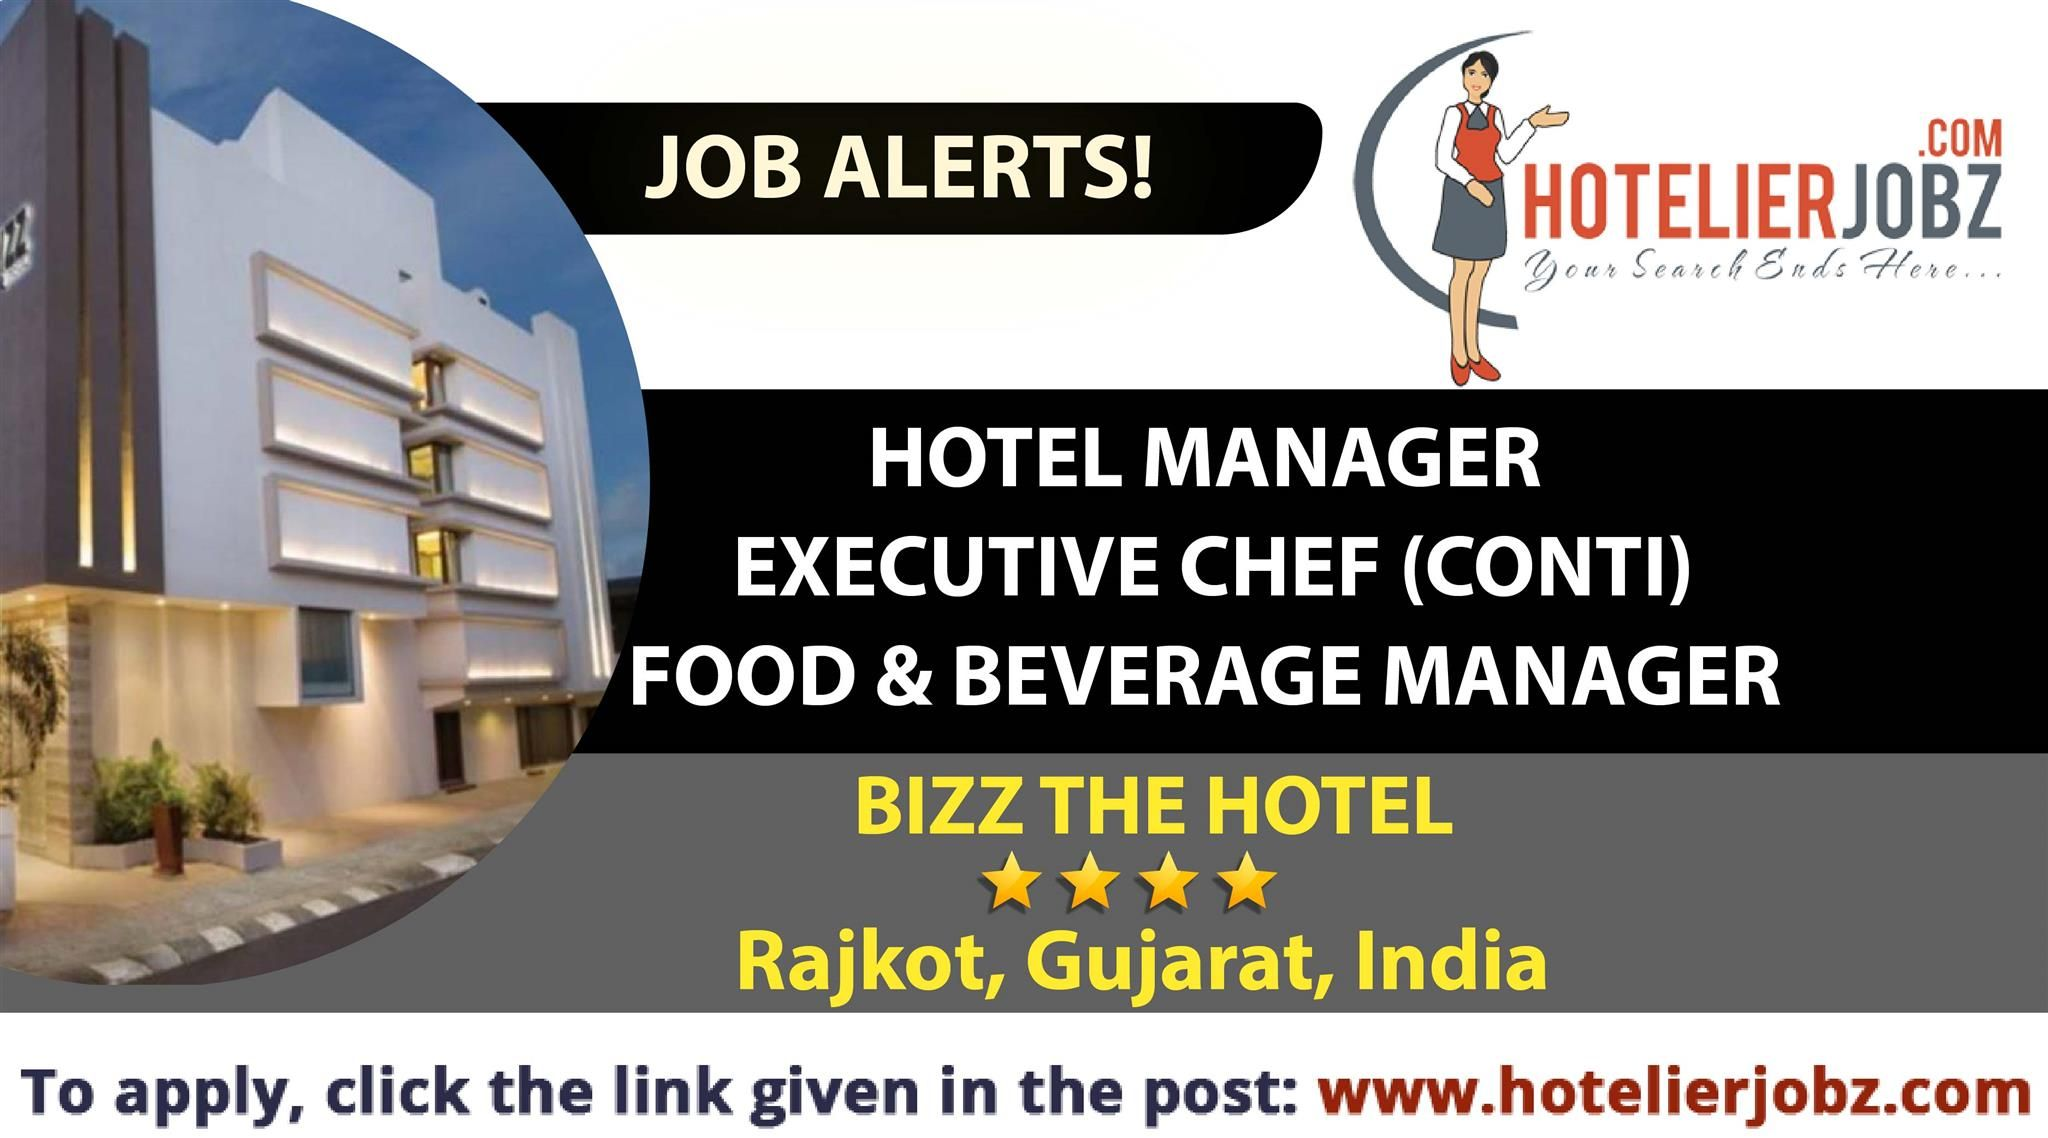 Bizz the hotel in rajkot gujarat india is hiring for